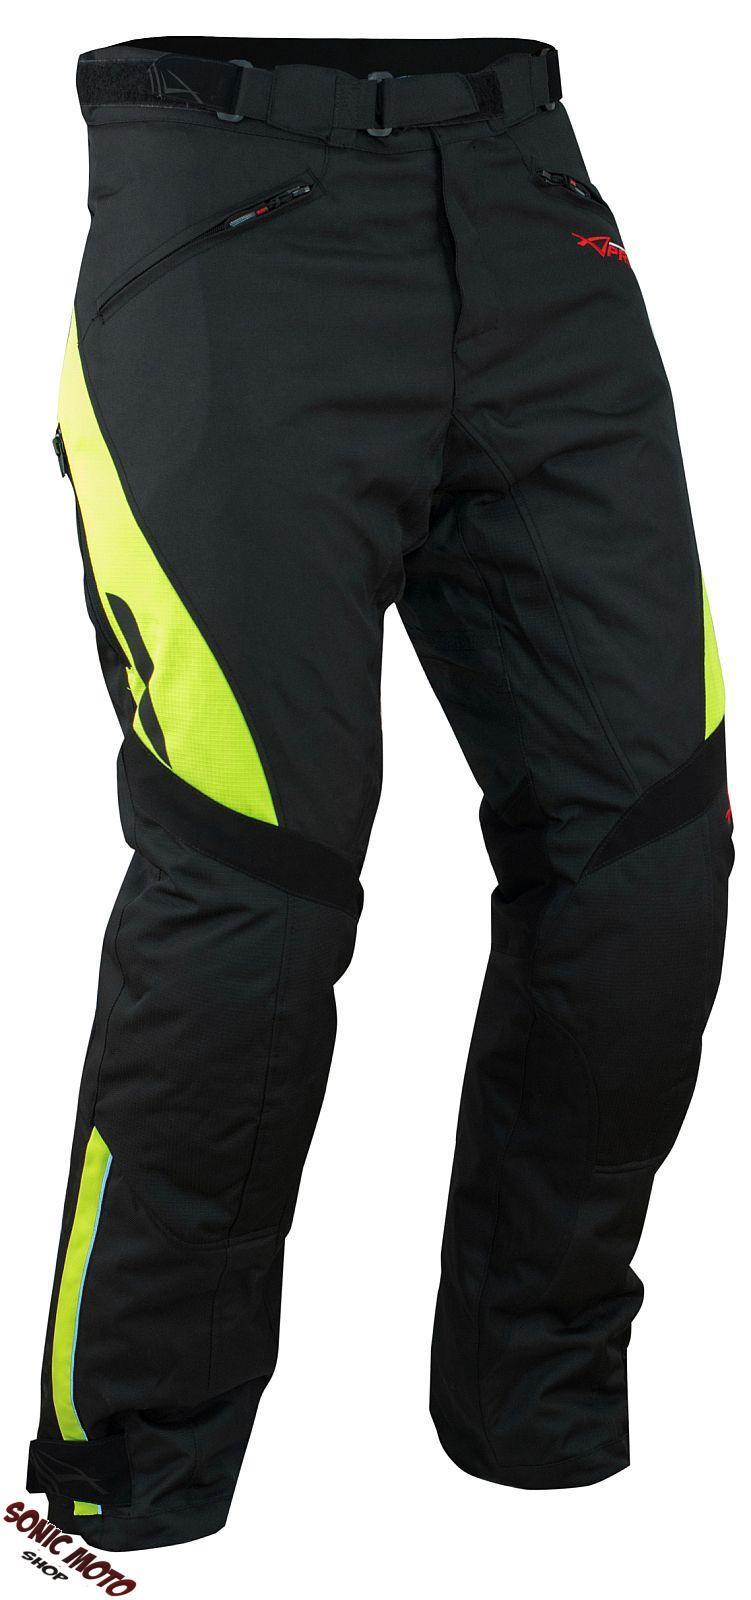 Pantalon-Impermeable-Homme-Protections-CE-Thermique-Motard-Moto-Fluo